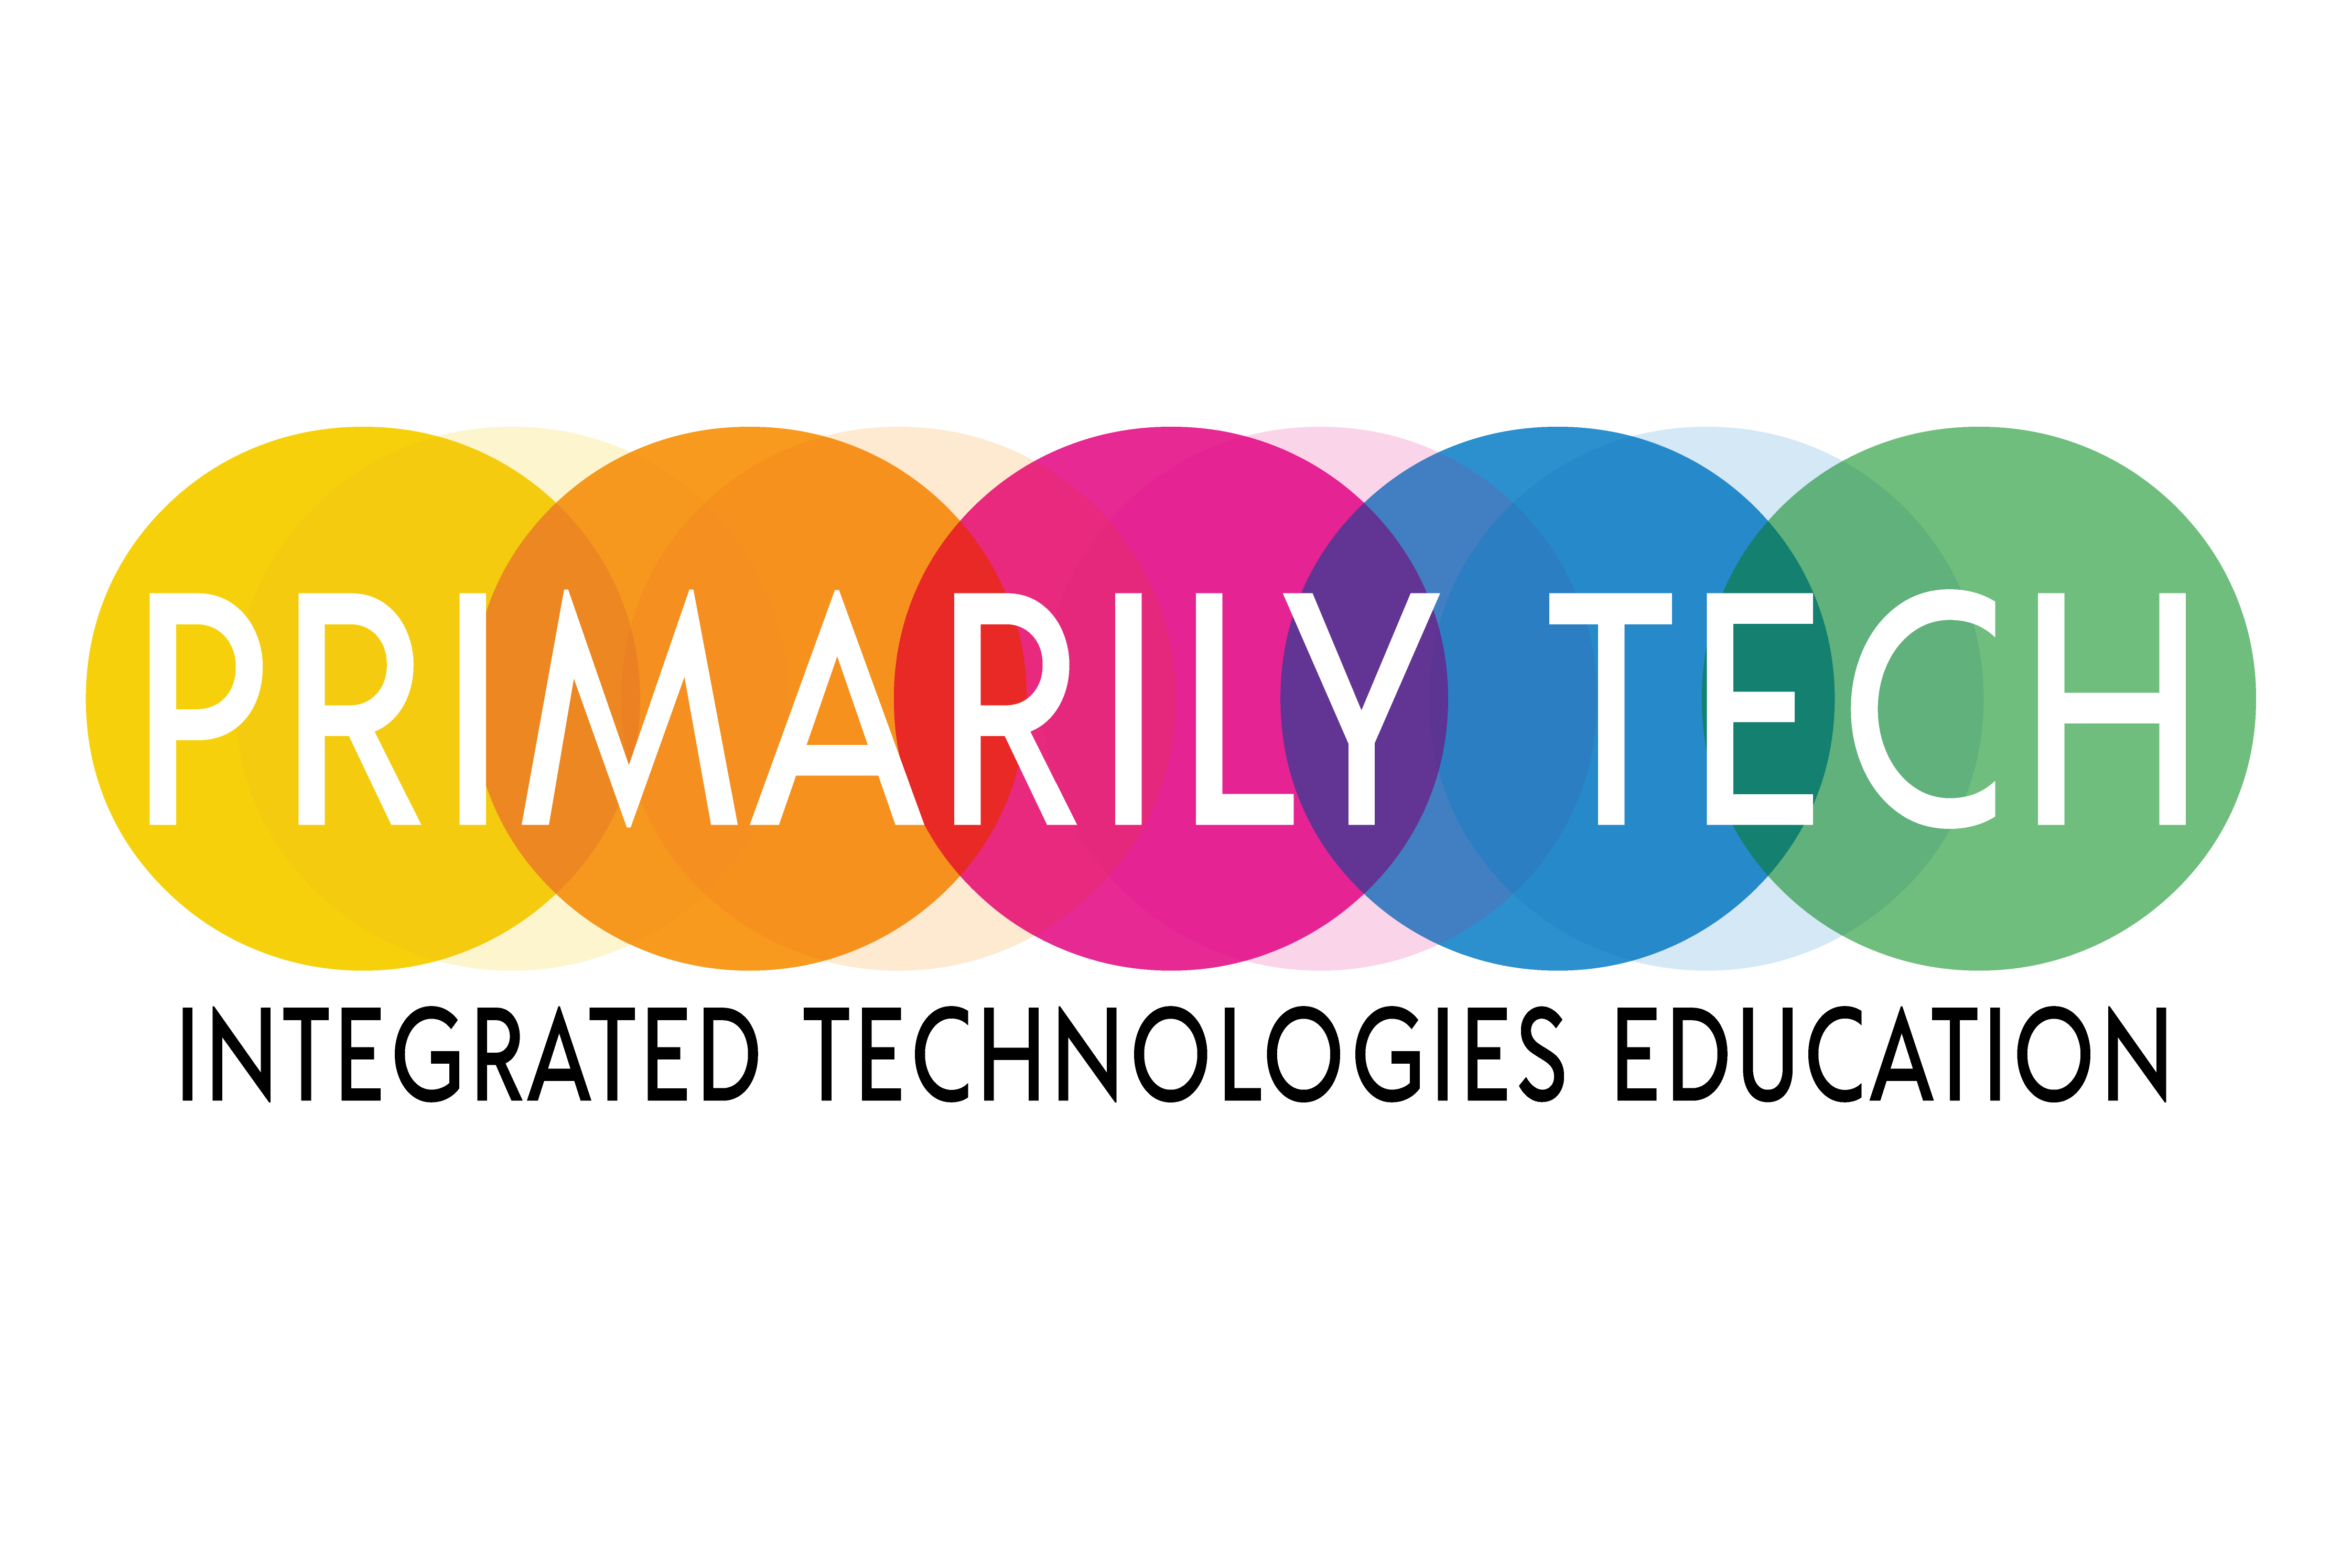 Primarily Tech